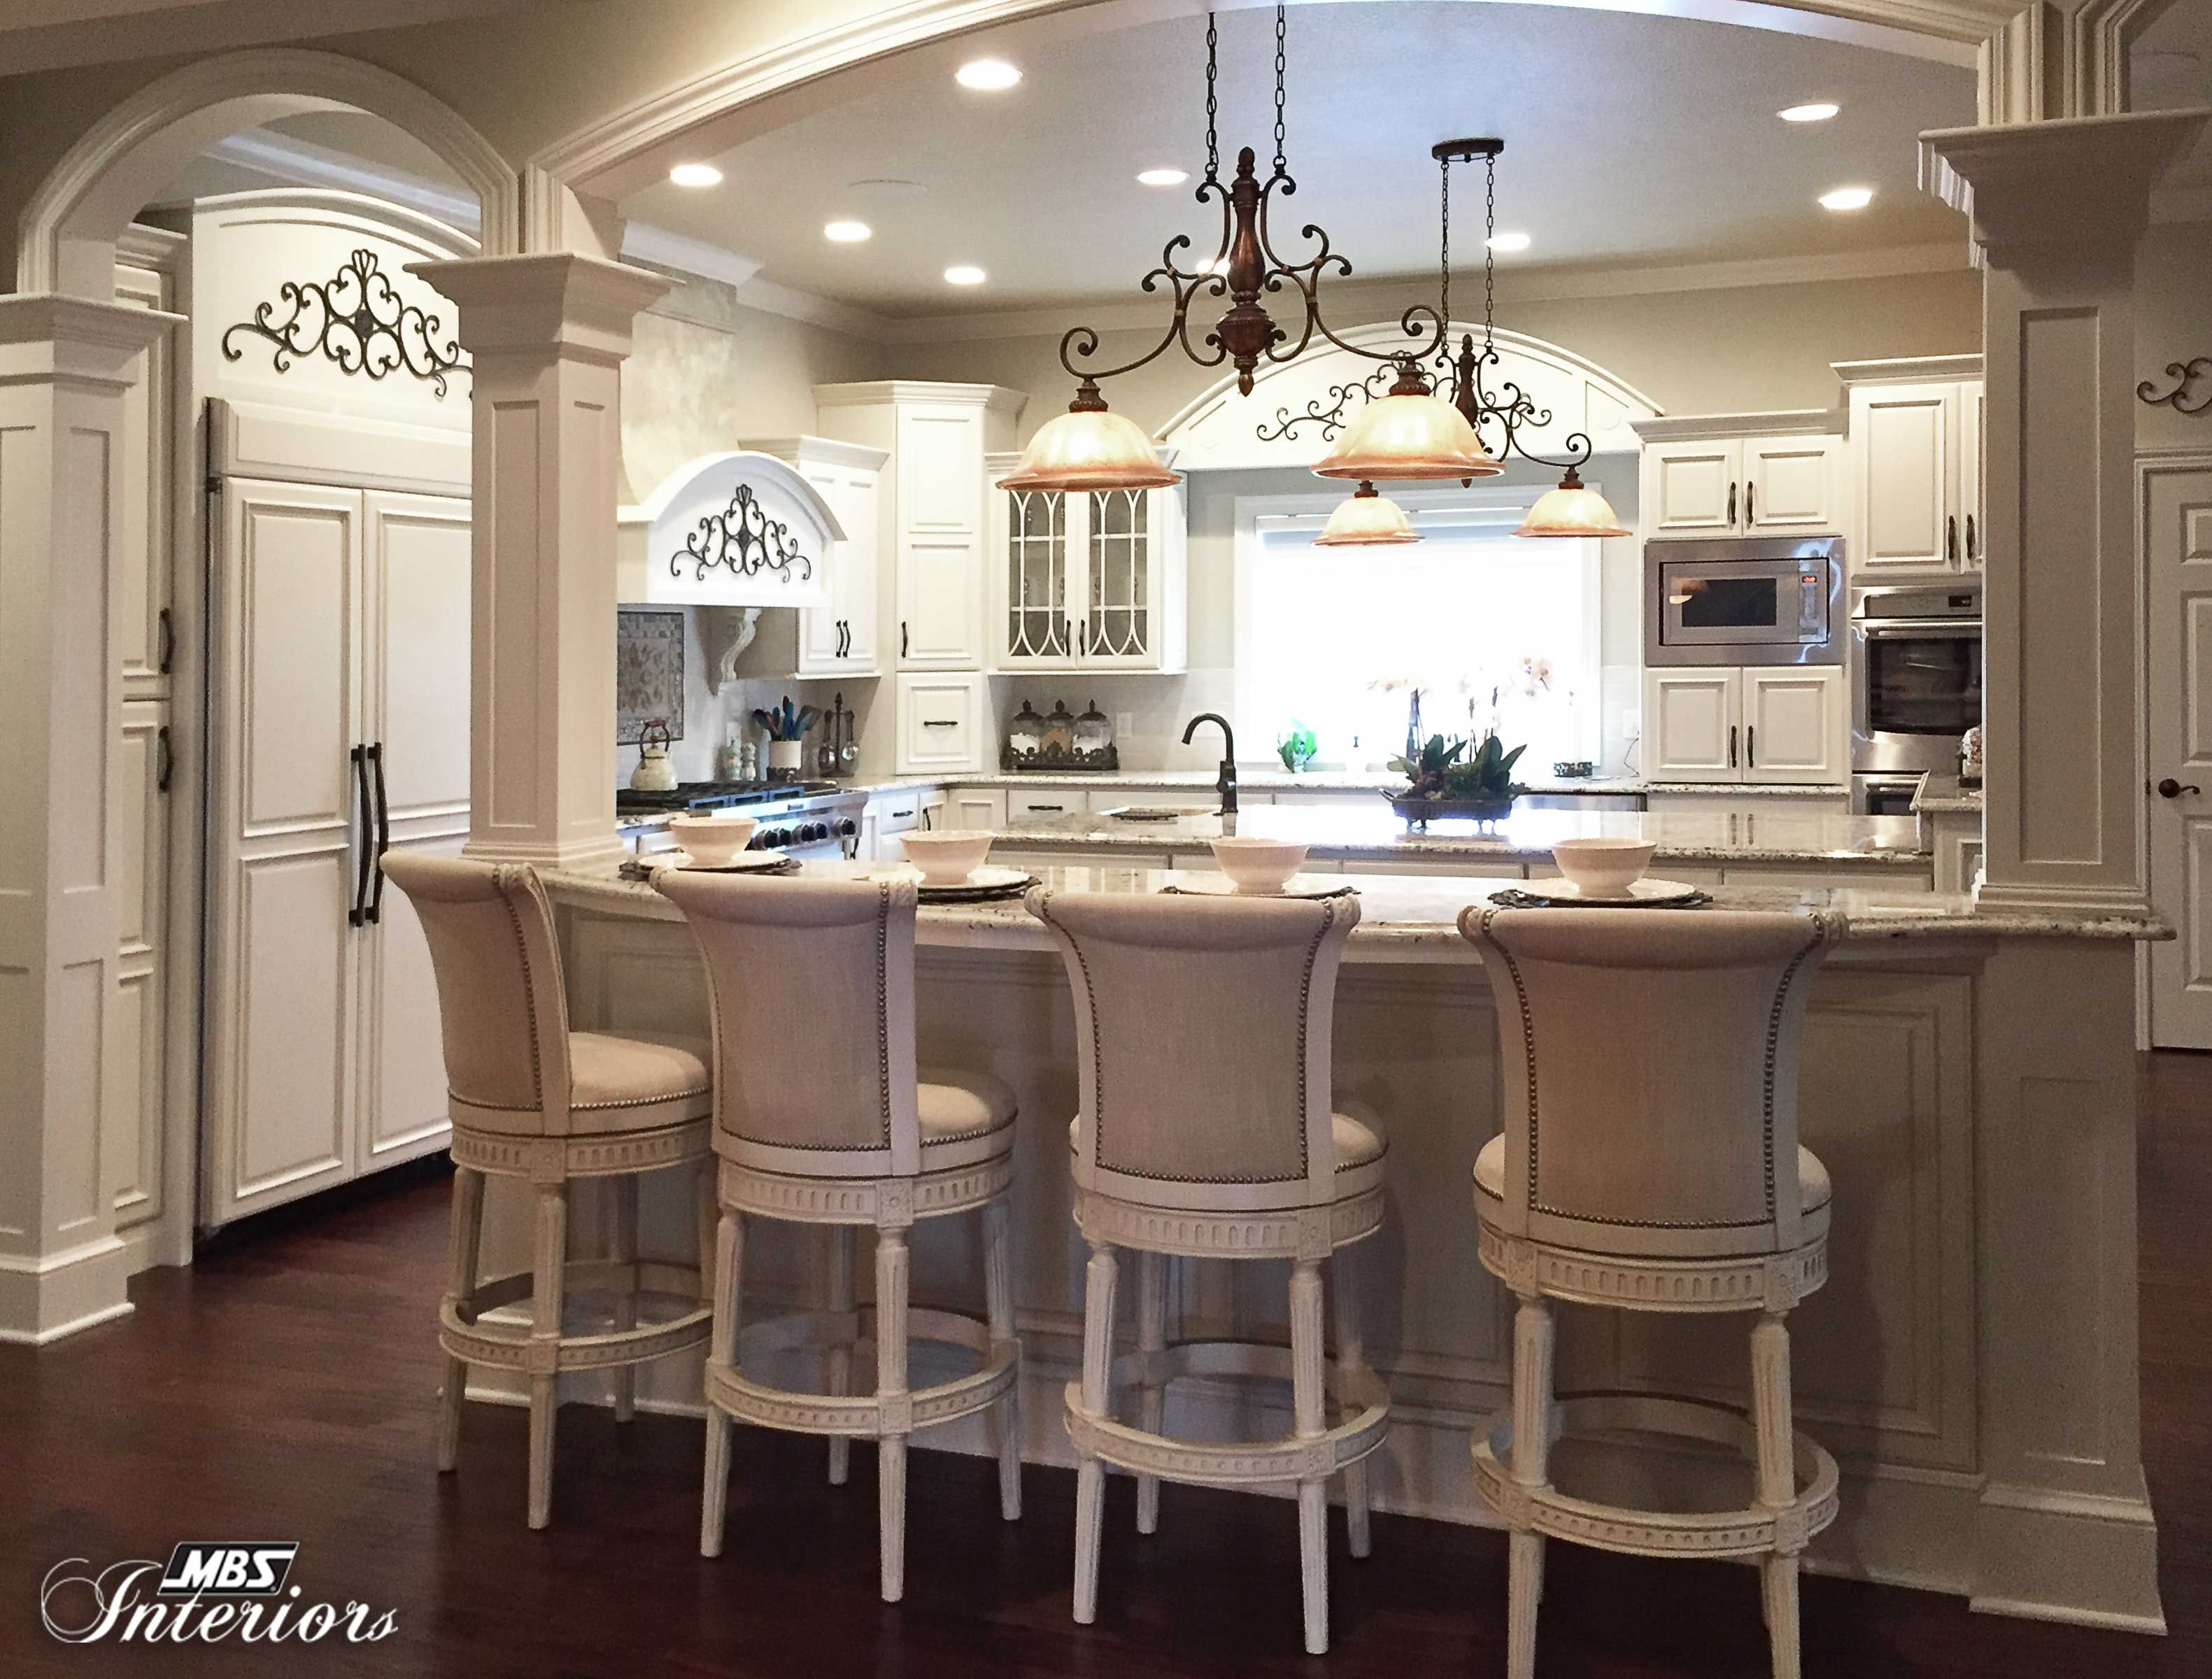 French Colonial Kitchen Victorian Kitchen Trendy Kitchen Backsplash Kitchen Design